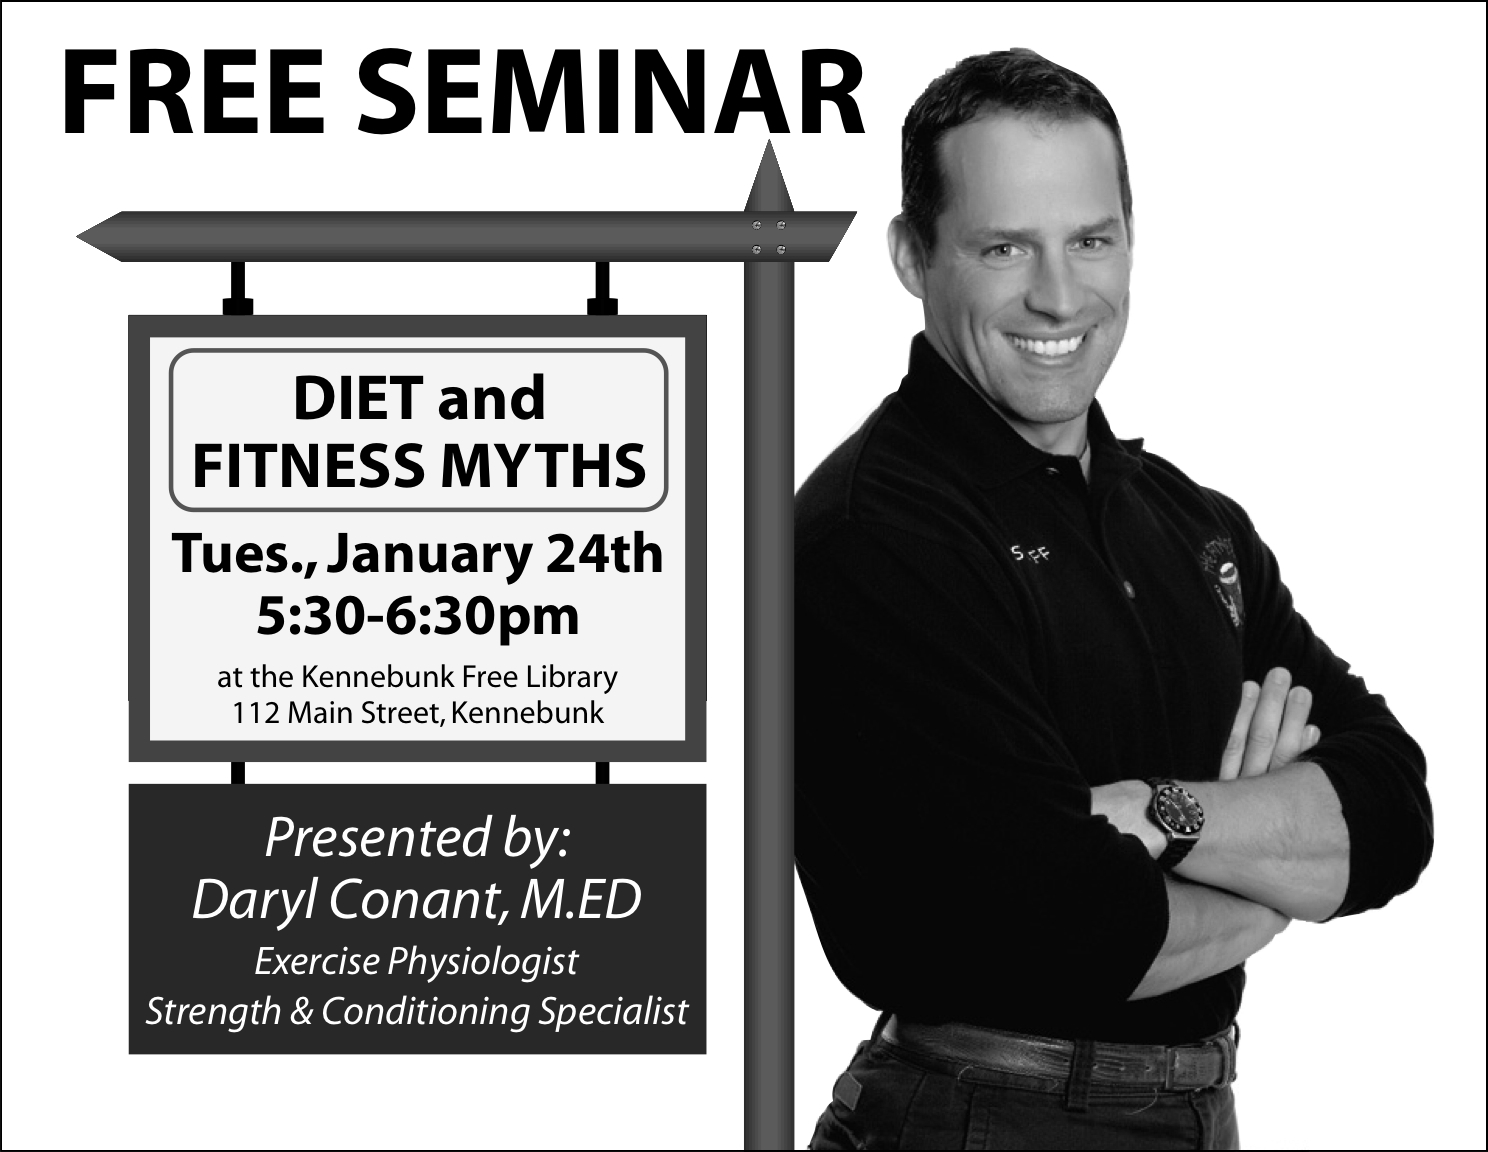 fitness_nut_seminar6x8